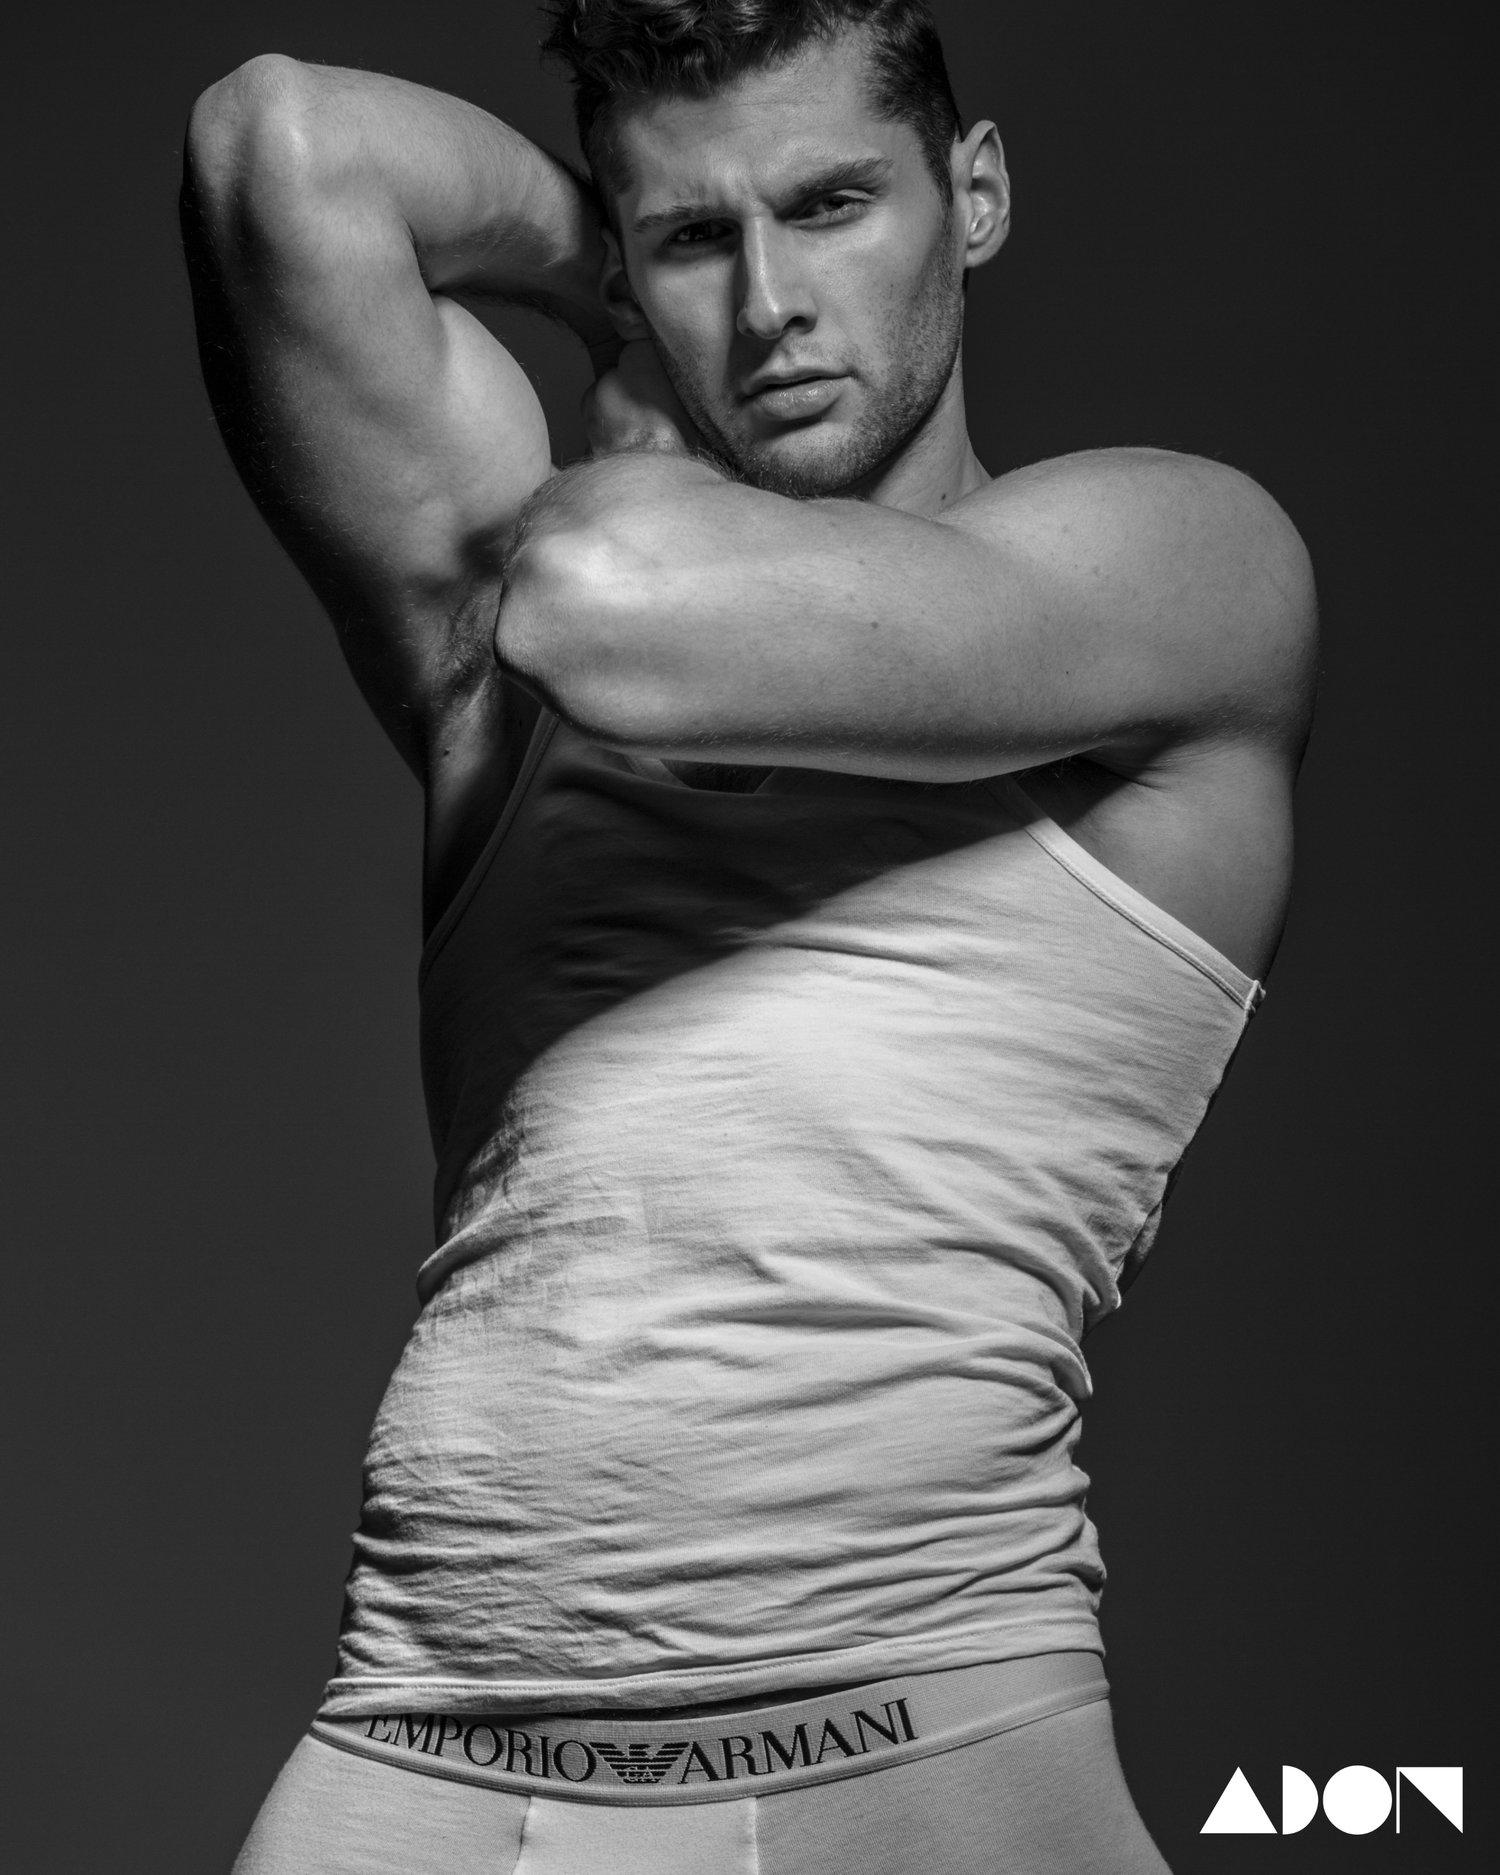 Adon Exclusive: Model Timo By Paul Van Der Linde